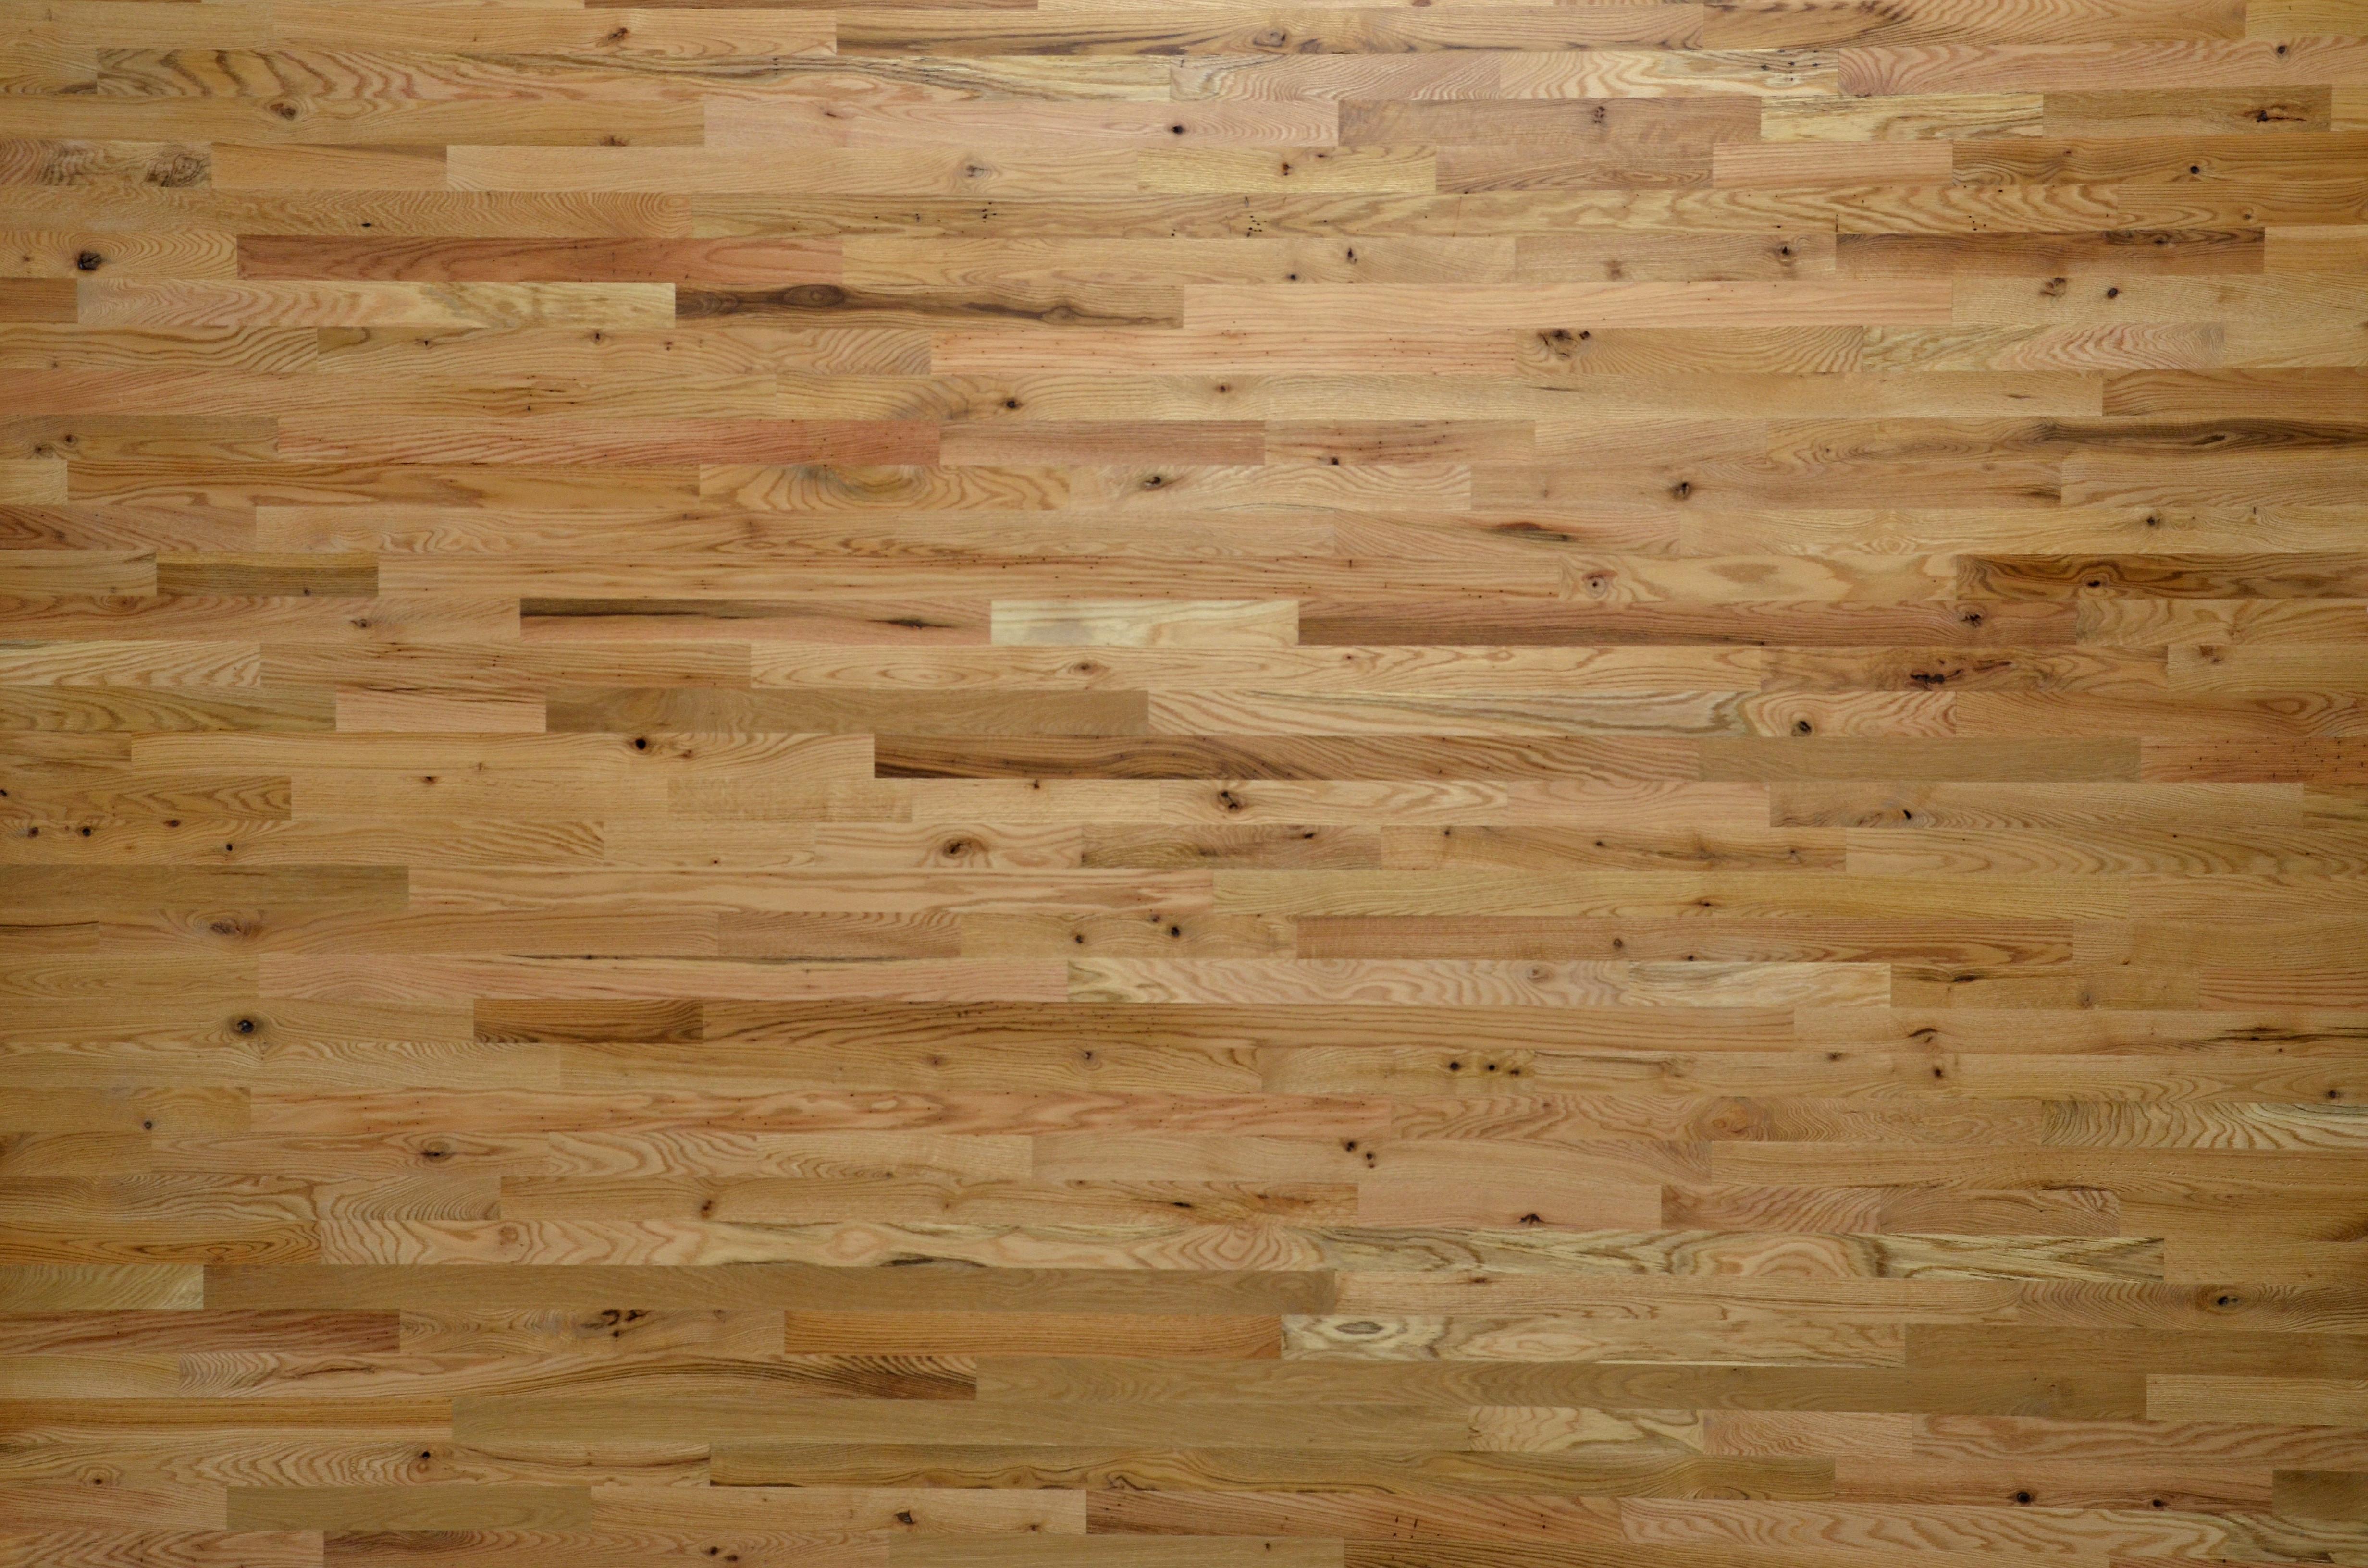 1 2 solid hardwood flooring of lacrosse hardwood flooring walnut white oak red oak hickory in 2 common red oak